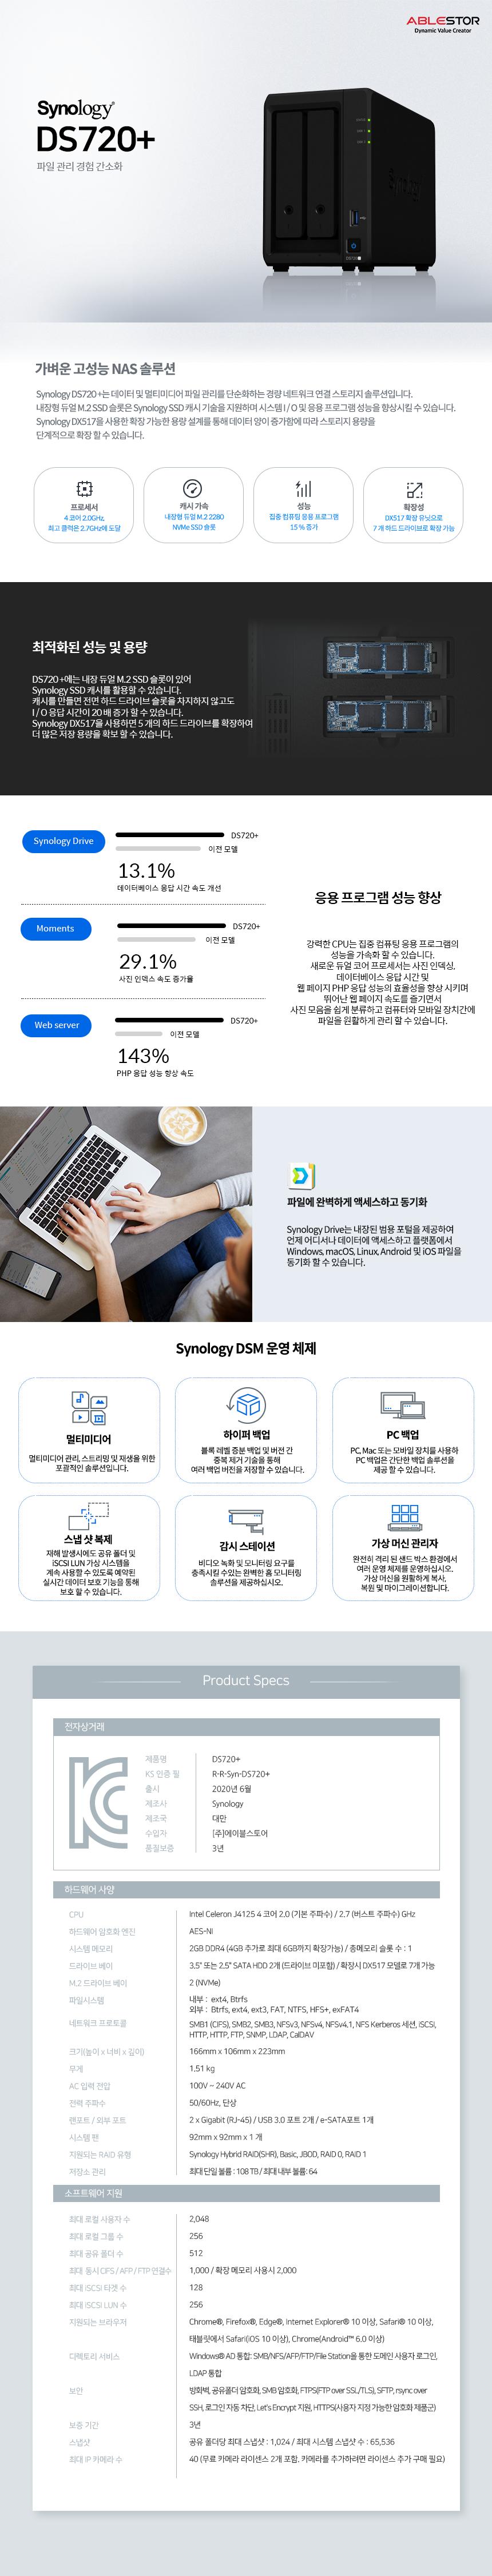 Synology DS720+ RAM 2GB (4TB)